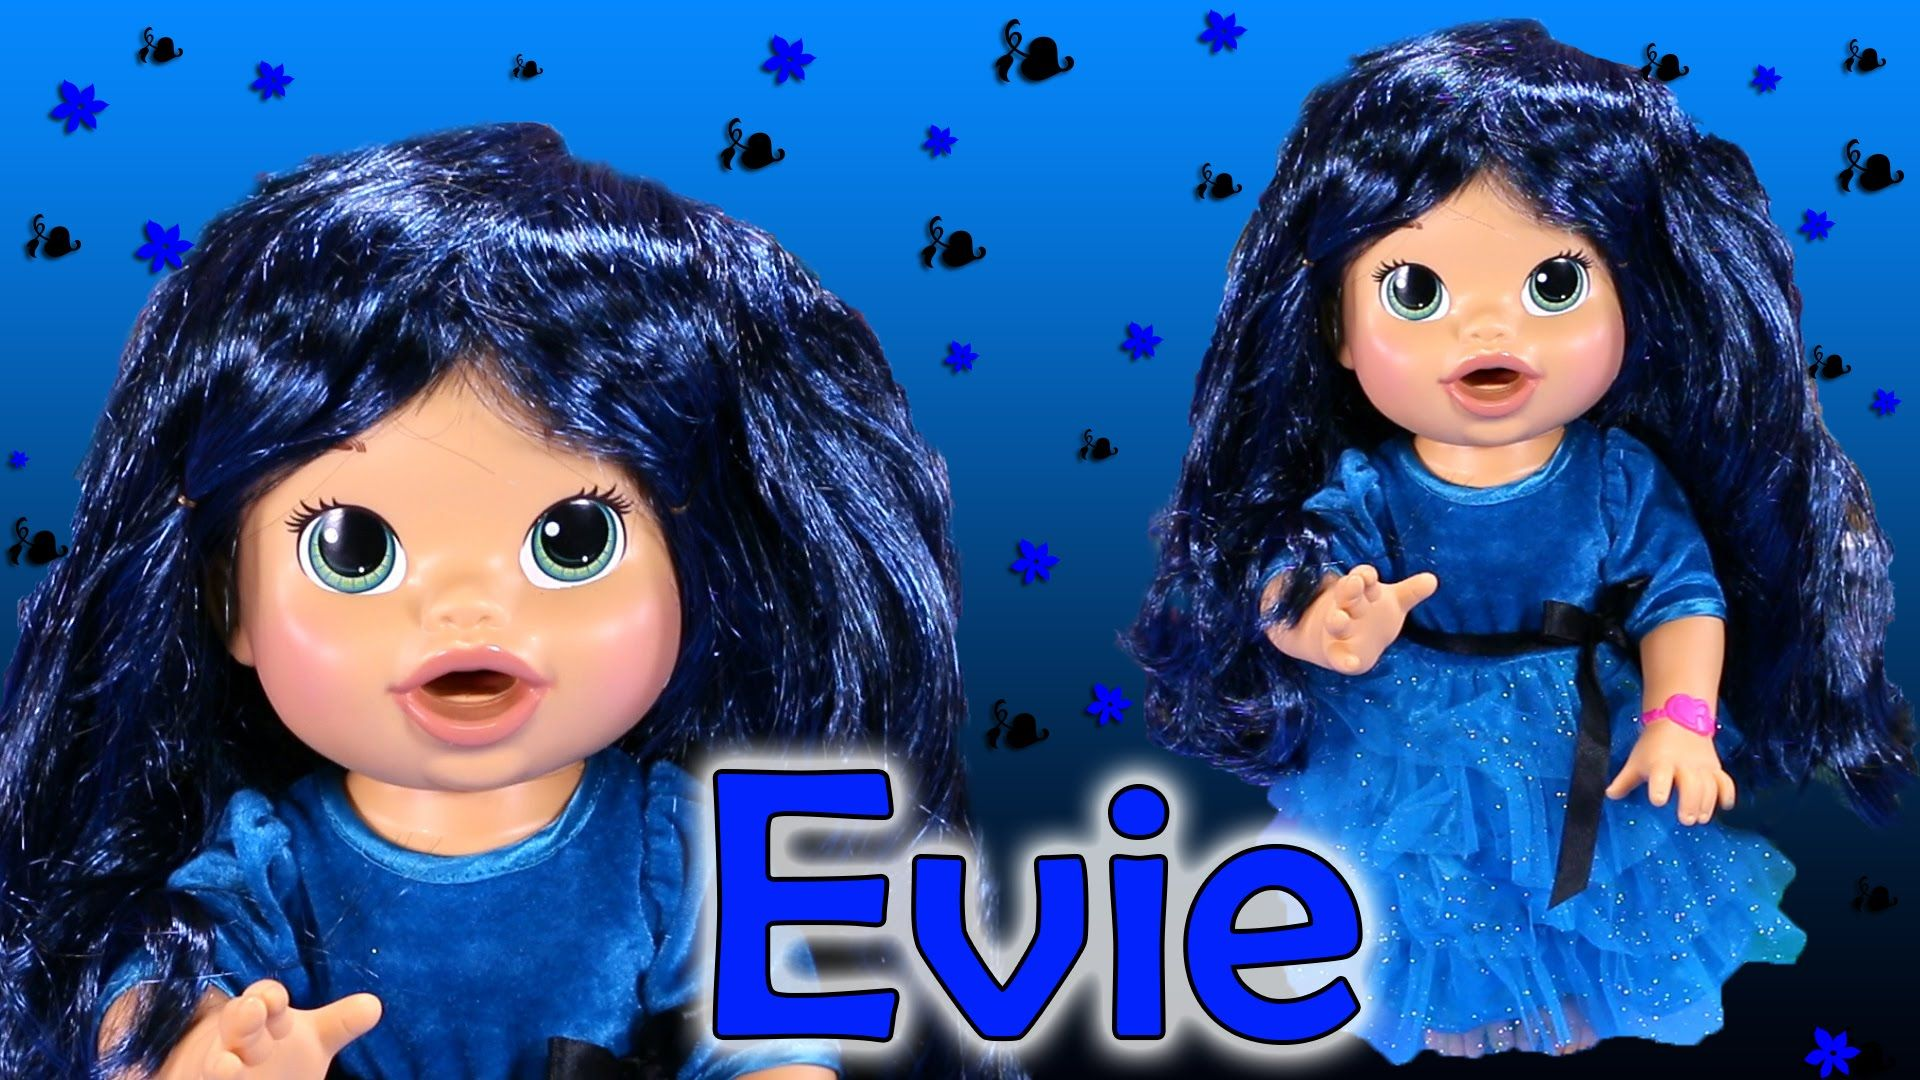 Descendants Evie Custom Baby Alive Eats Play Doh Treats Poops Blind Bag Toys Surprises Baby Alive Custom Baby Play Doh